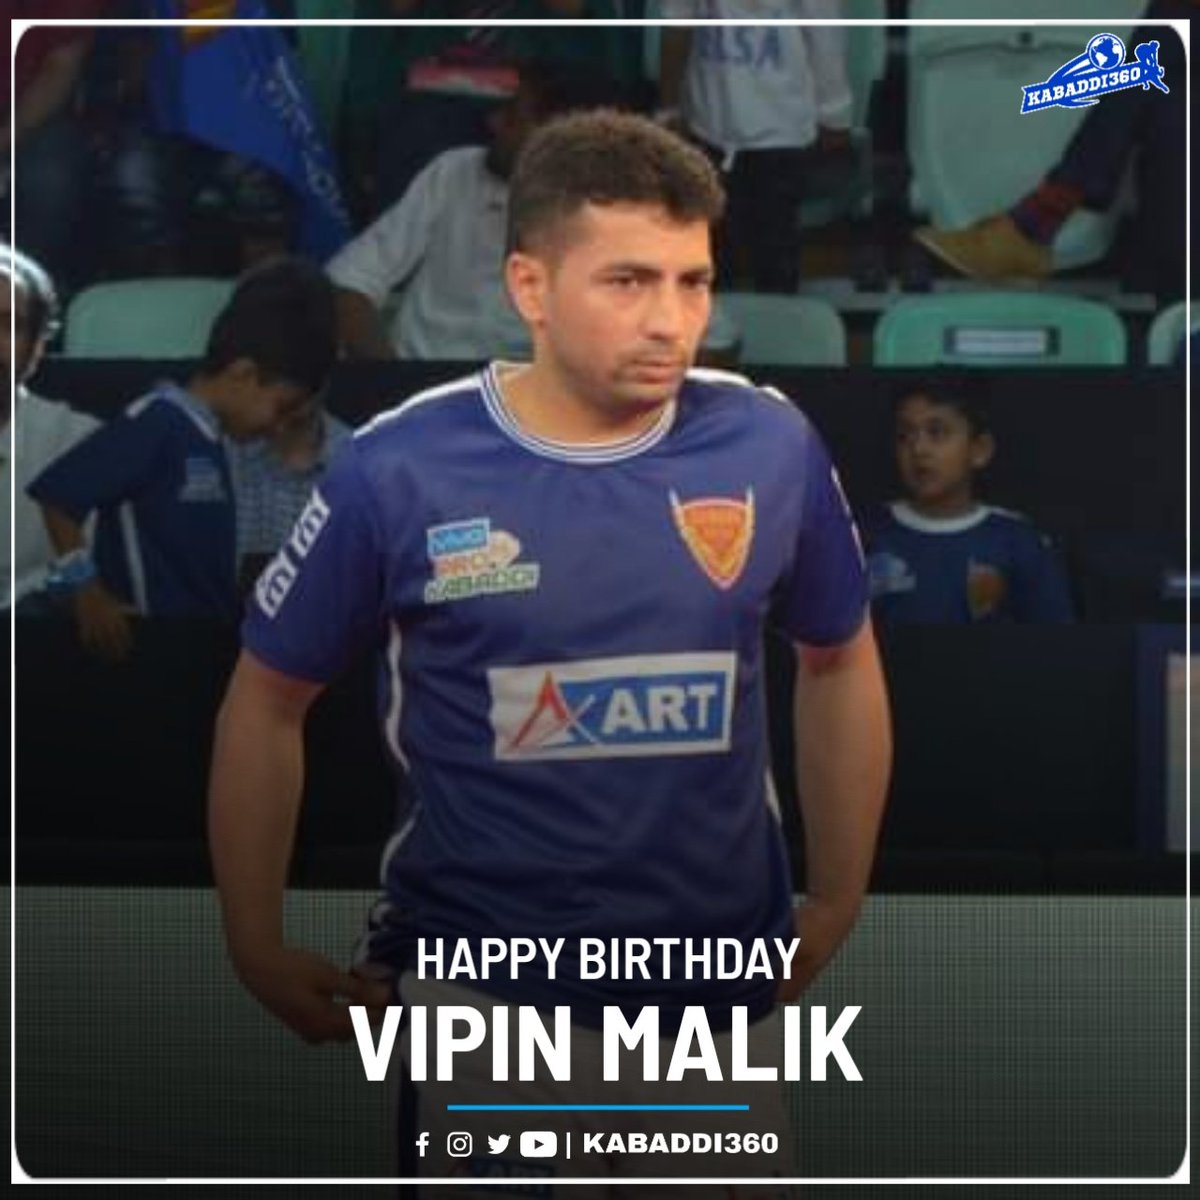 Wishing former Dabang Delhi K.C.'s raider @vipinmalik002 a very happy birthday 🎂  #VipinMalik #HappyBirthday #Kabaddi360